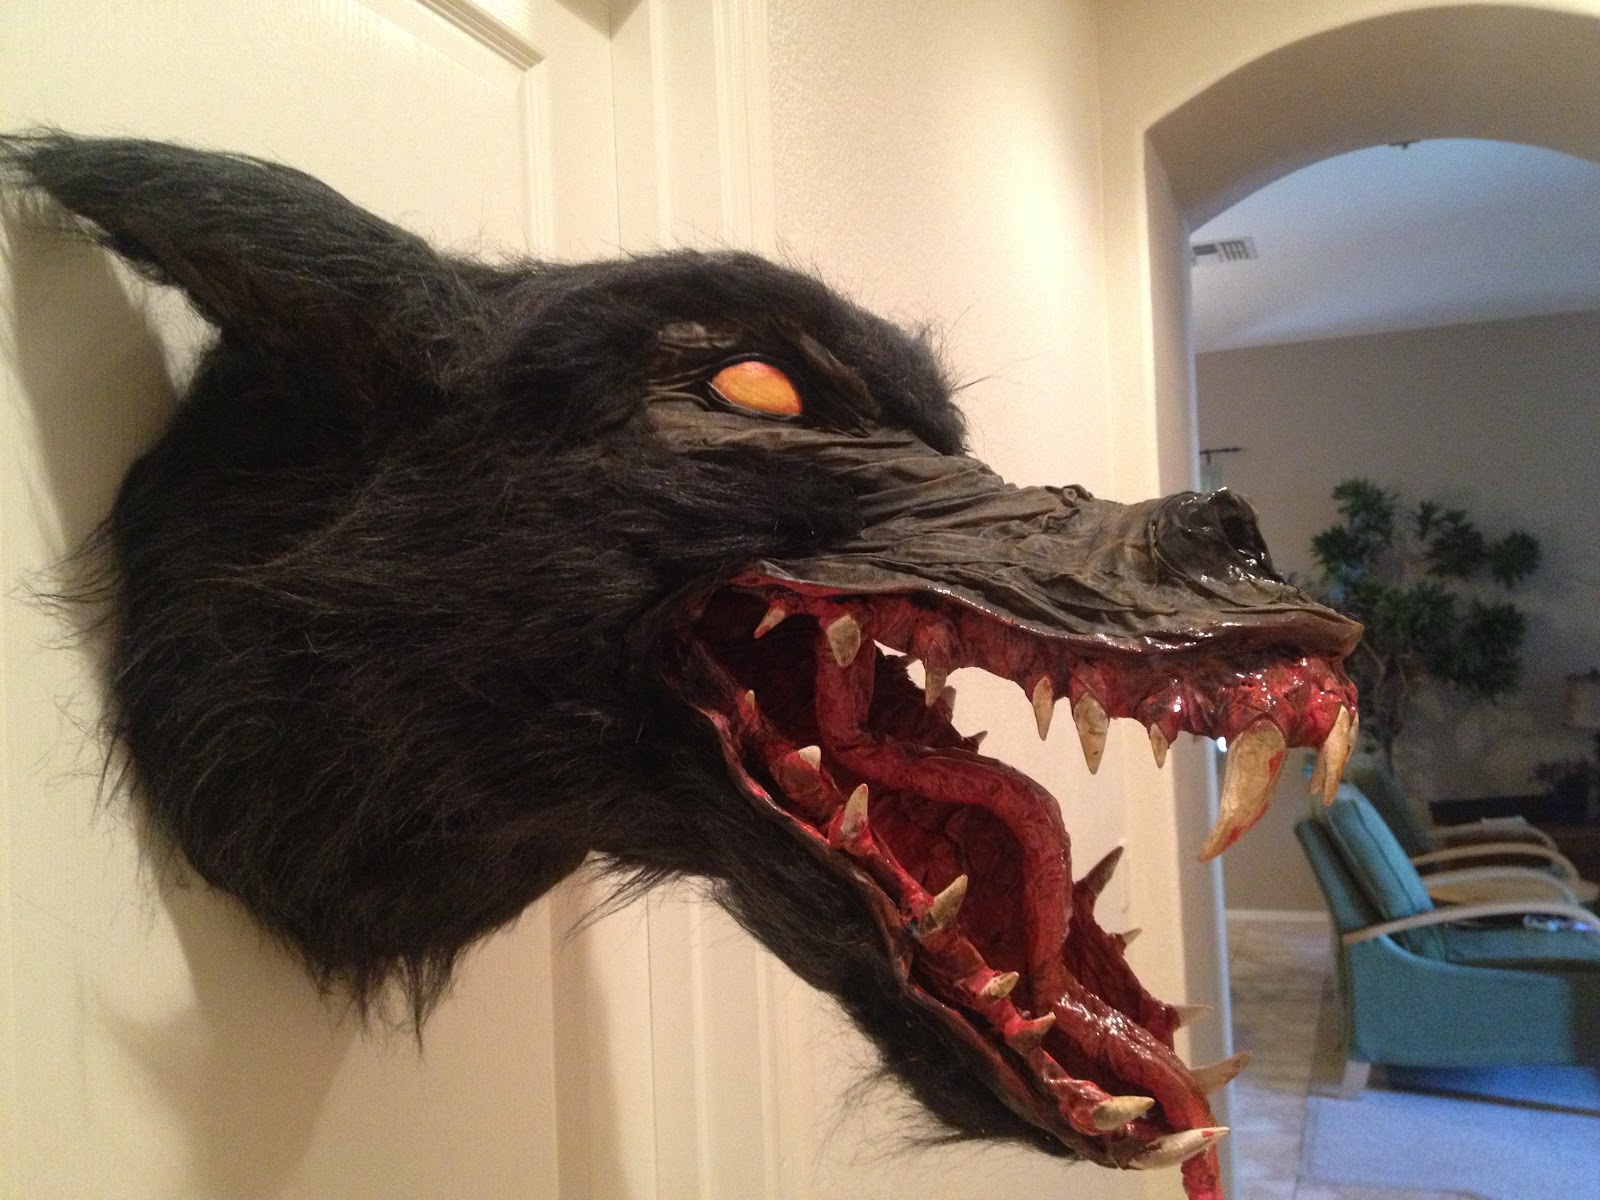 #33 The Big Bad Wolf